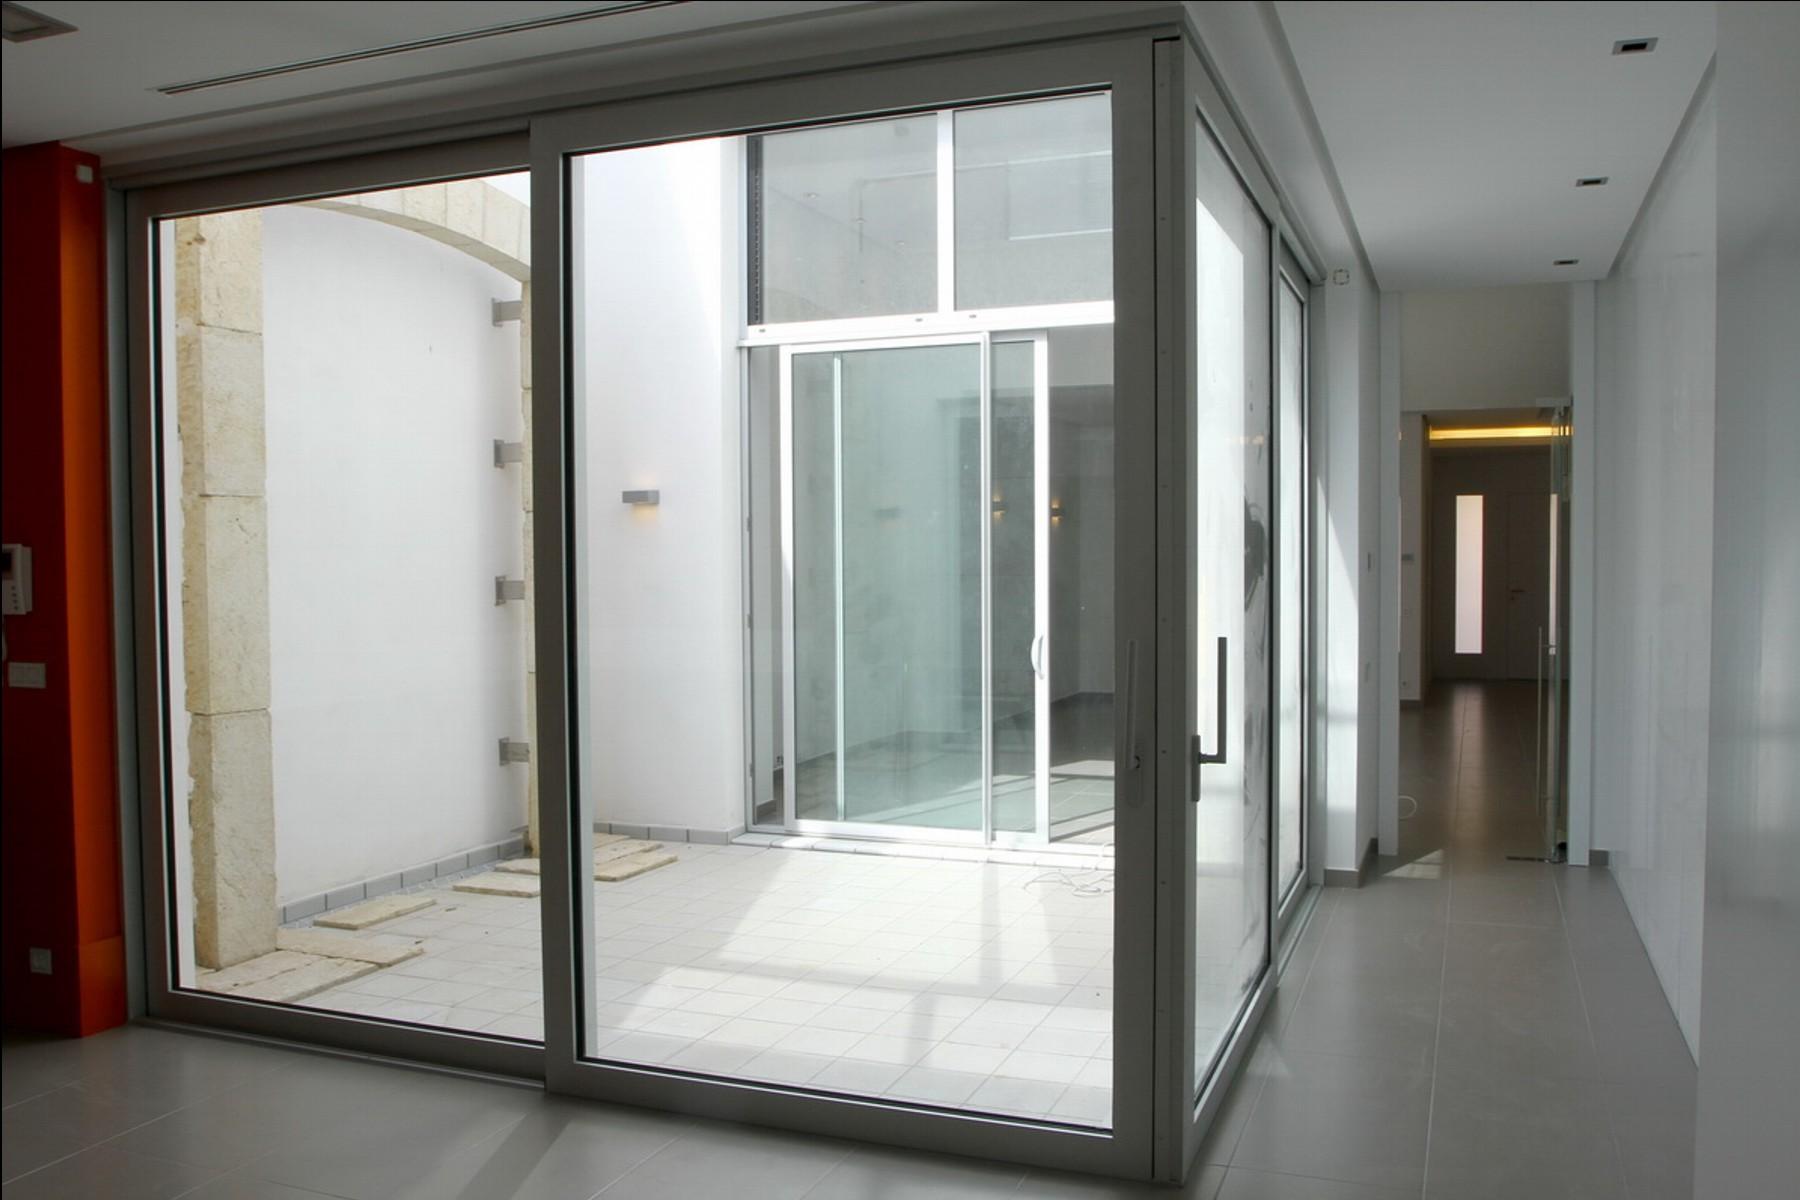 Imaginarq-306-Vivienda-unifamiliar-Ondara-Alicante-23a